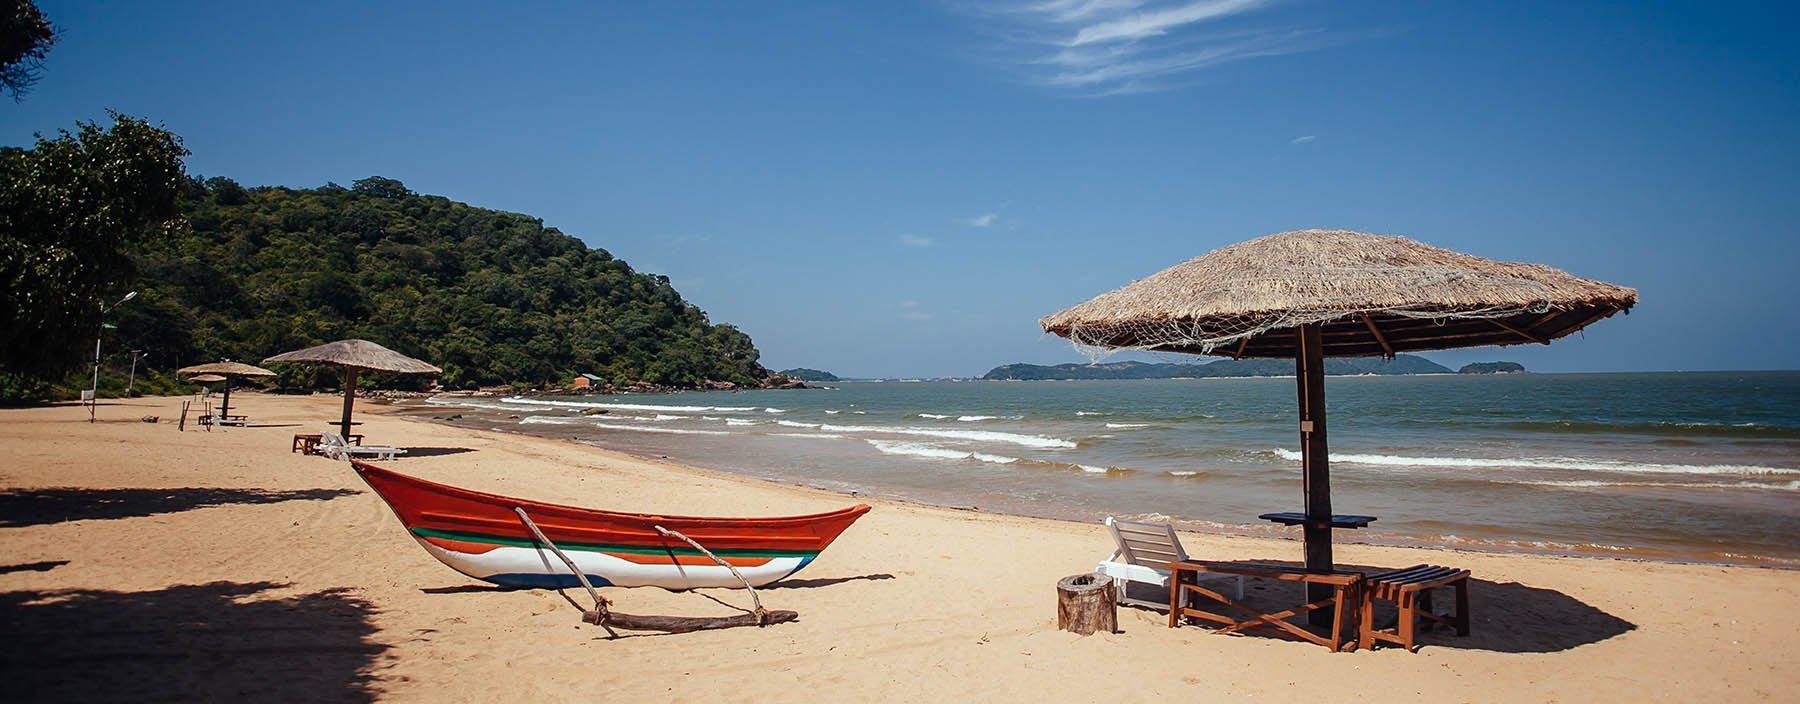 sri lanka, trincomalee, marble beach.jpg